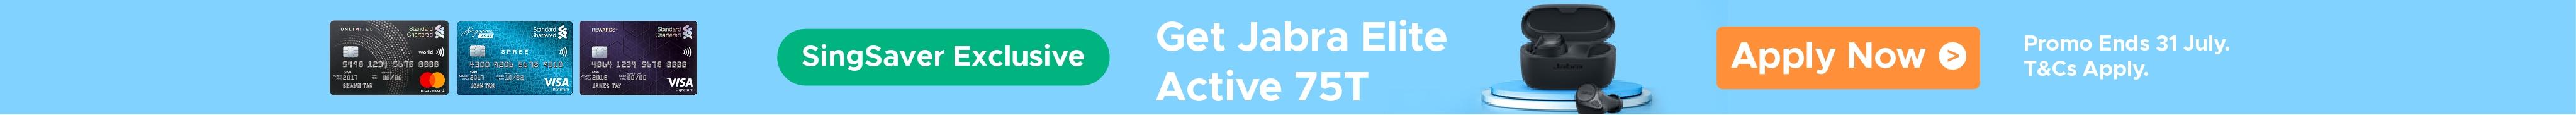 SS_JabraActivexSCB_RPB_R6-01.jpg